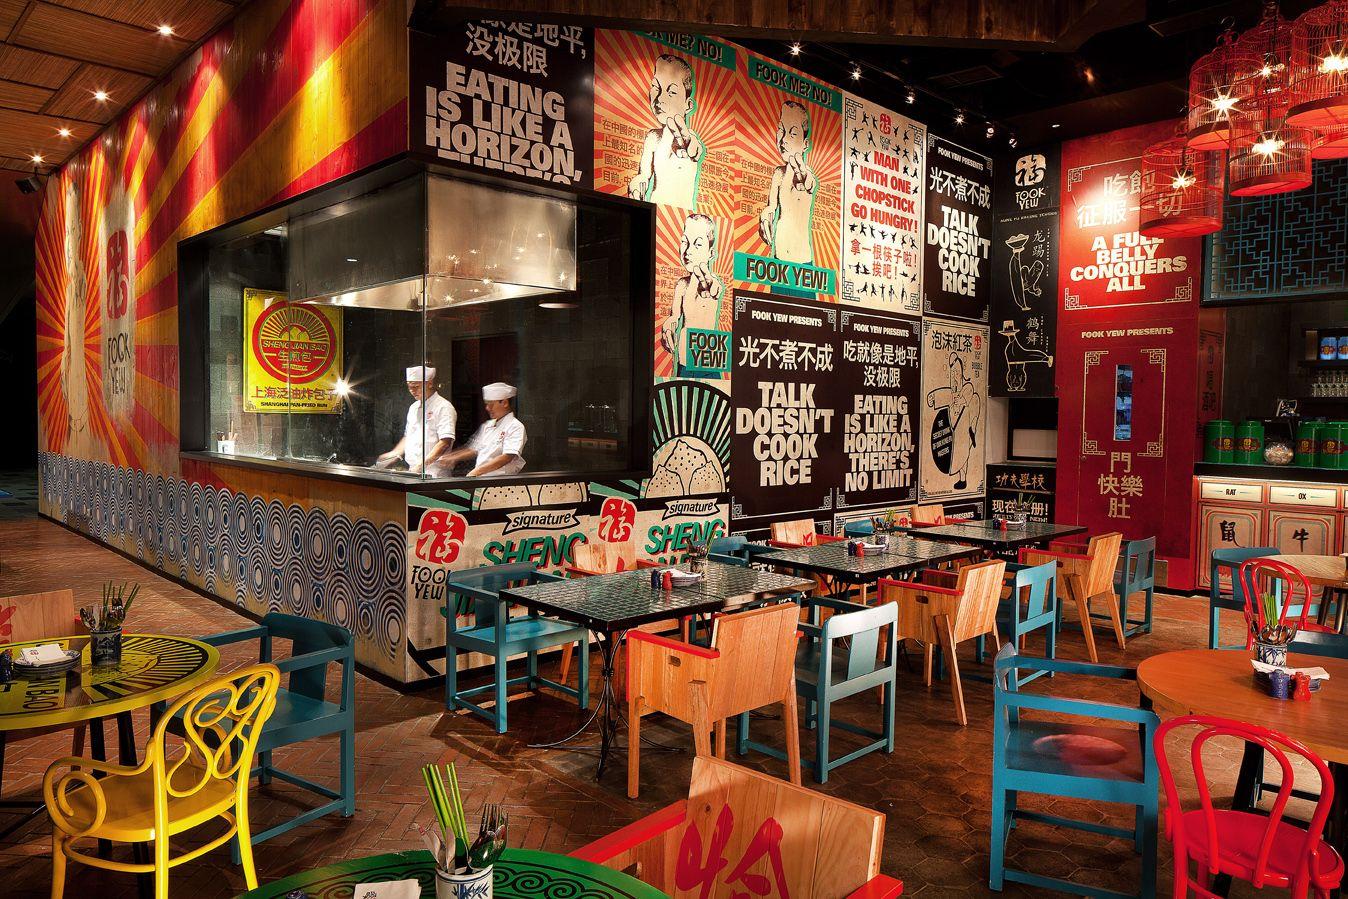 Fook yew bar restaurant design mexican